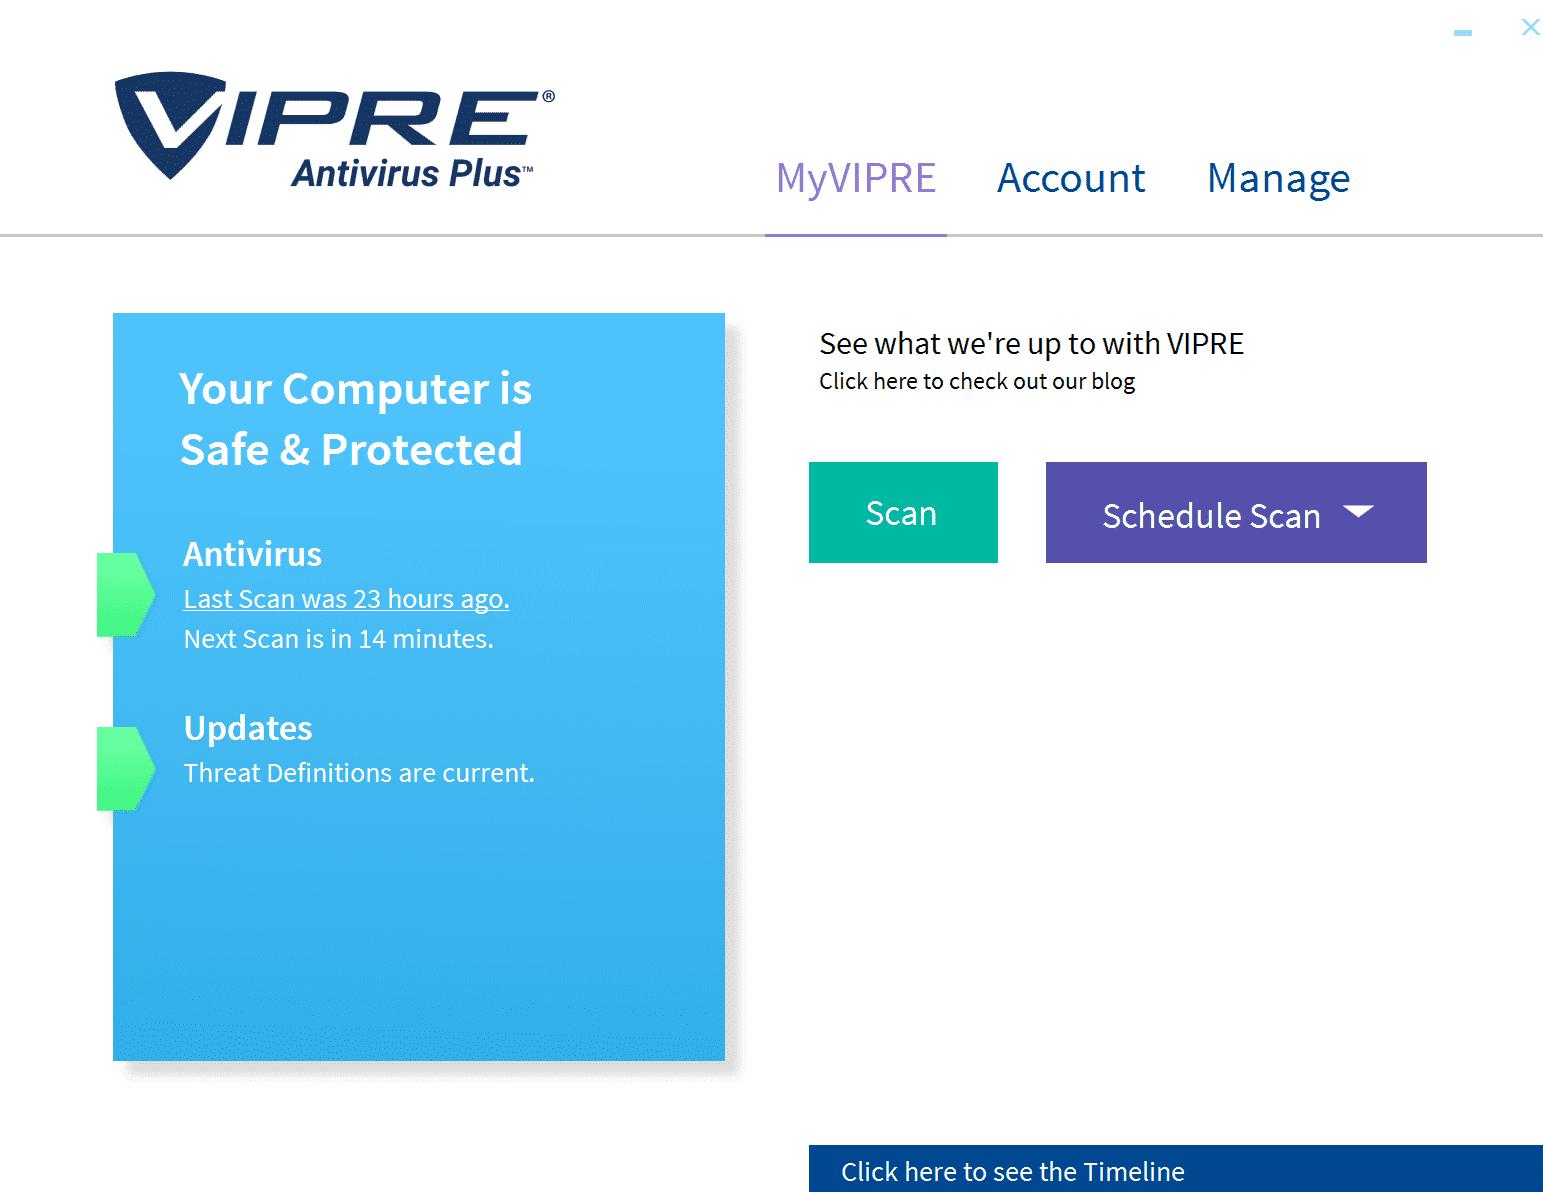 Vipre antivirus features